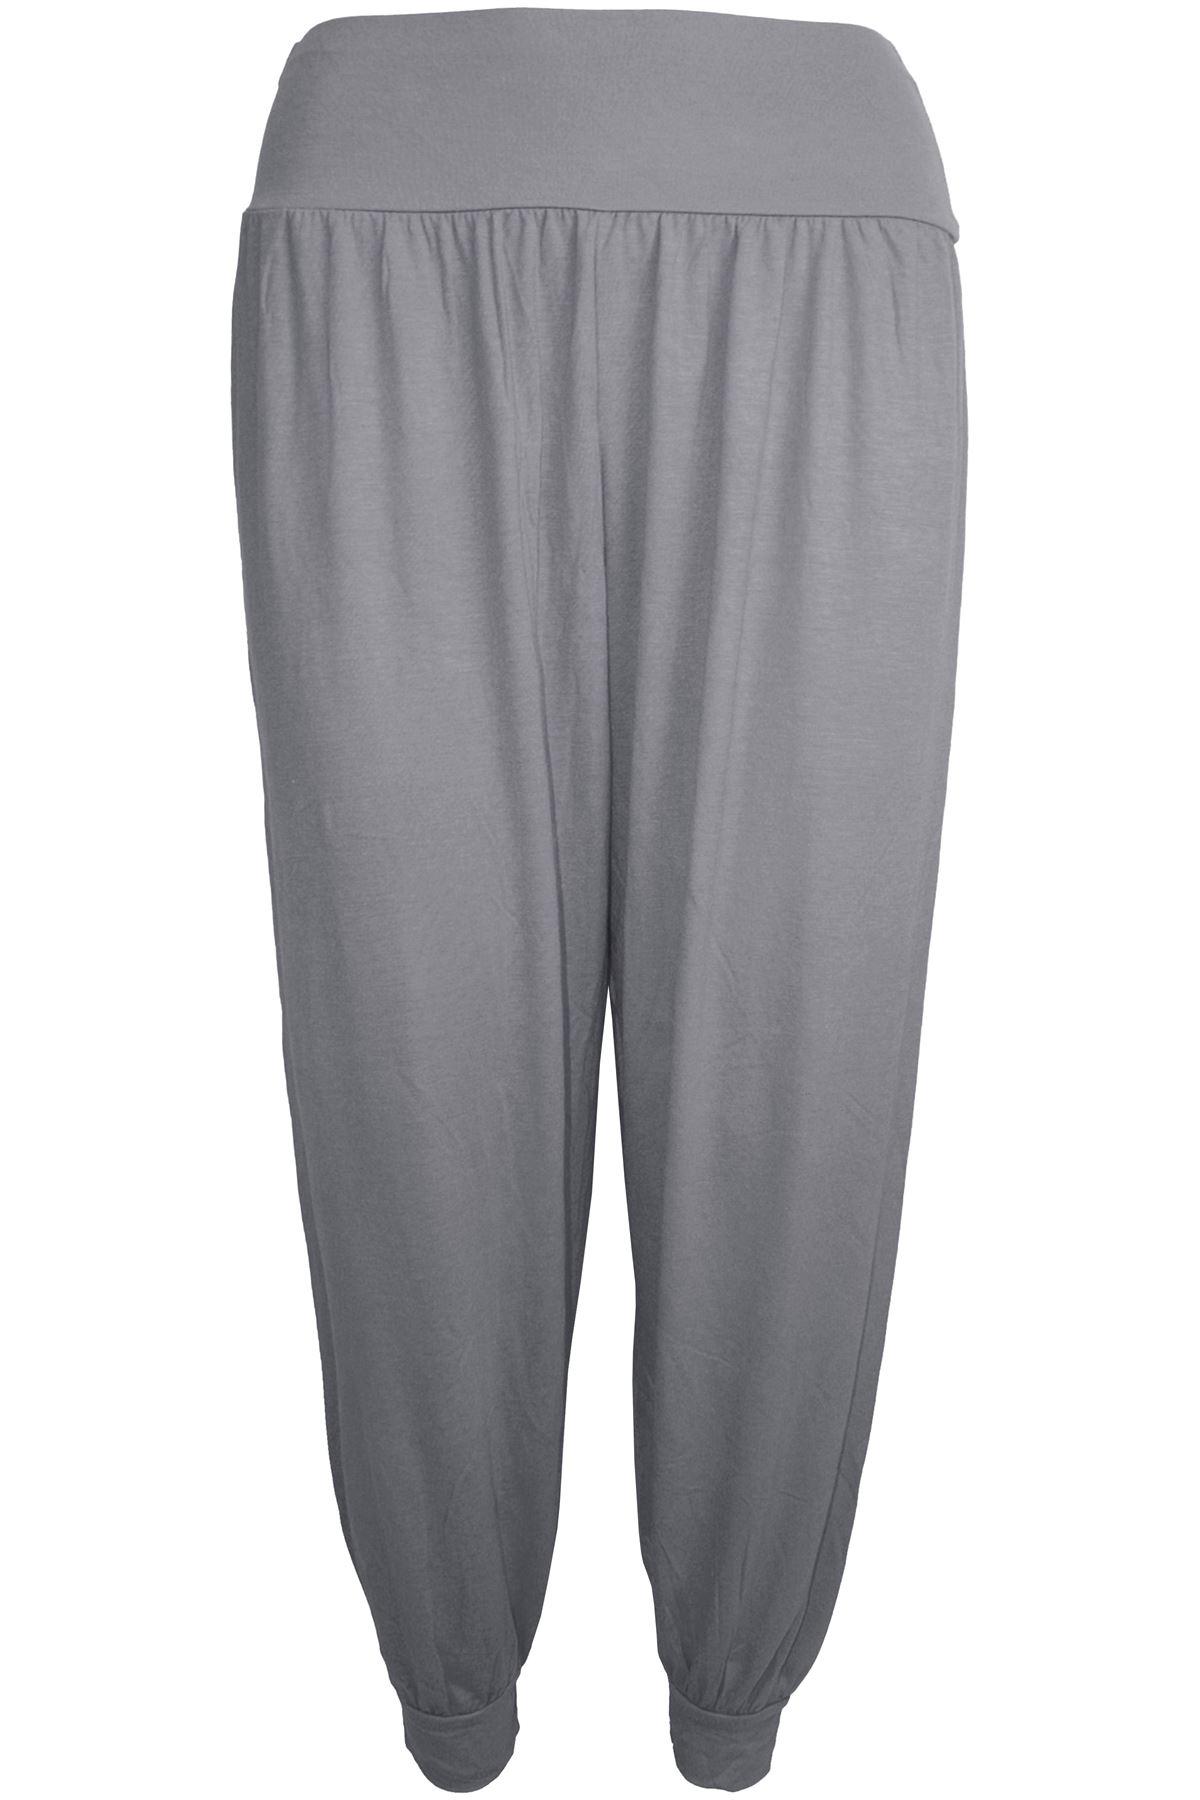 Grande Taille Femme Baggy Harem Ali Baba Pleine Longueur Pantalon Leggings Pantalon